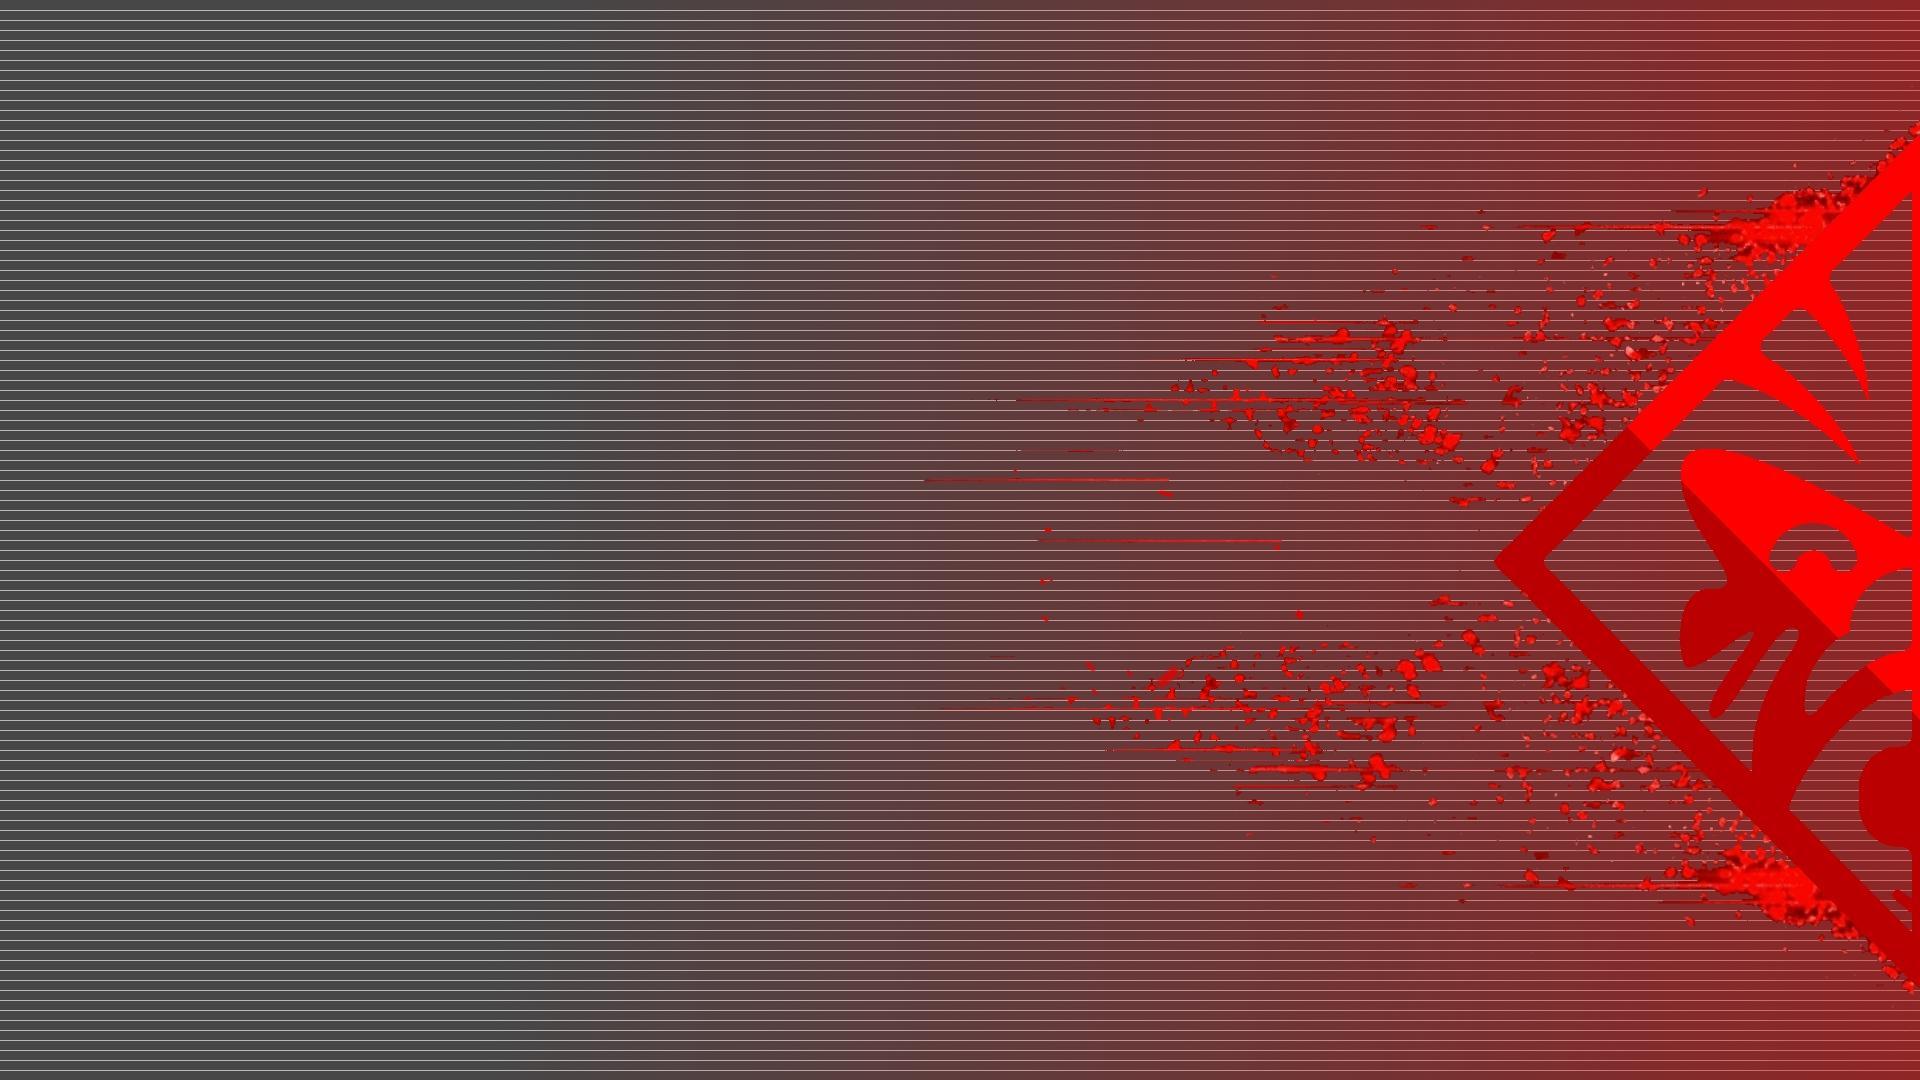 HD Omen Desktop Wallpapers - Wallpaper Cave